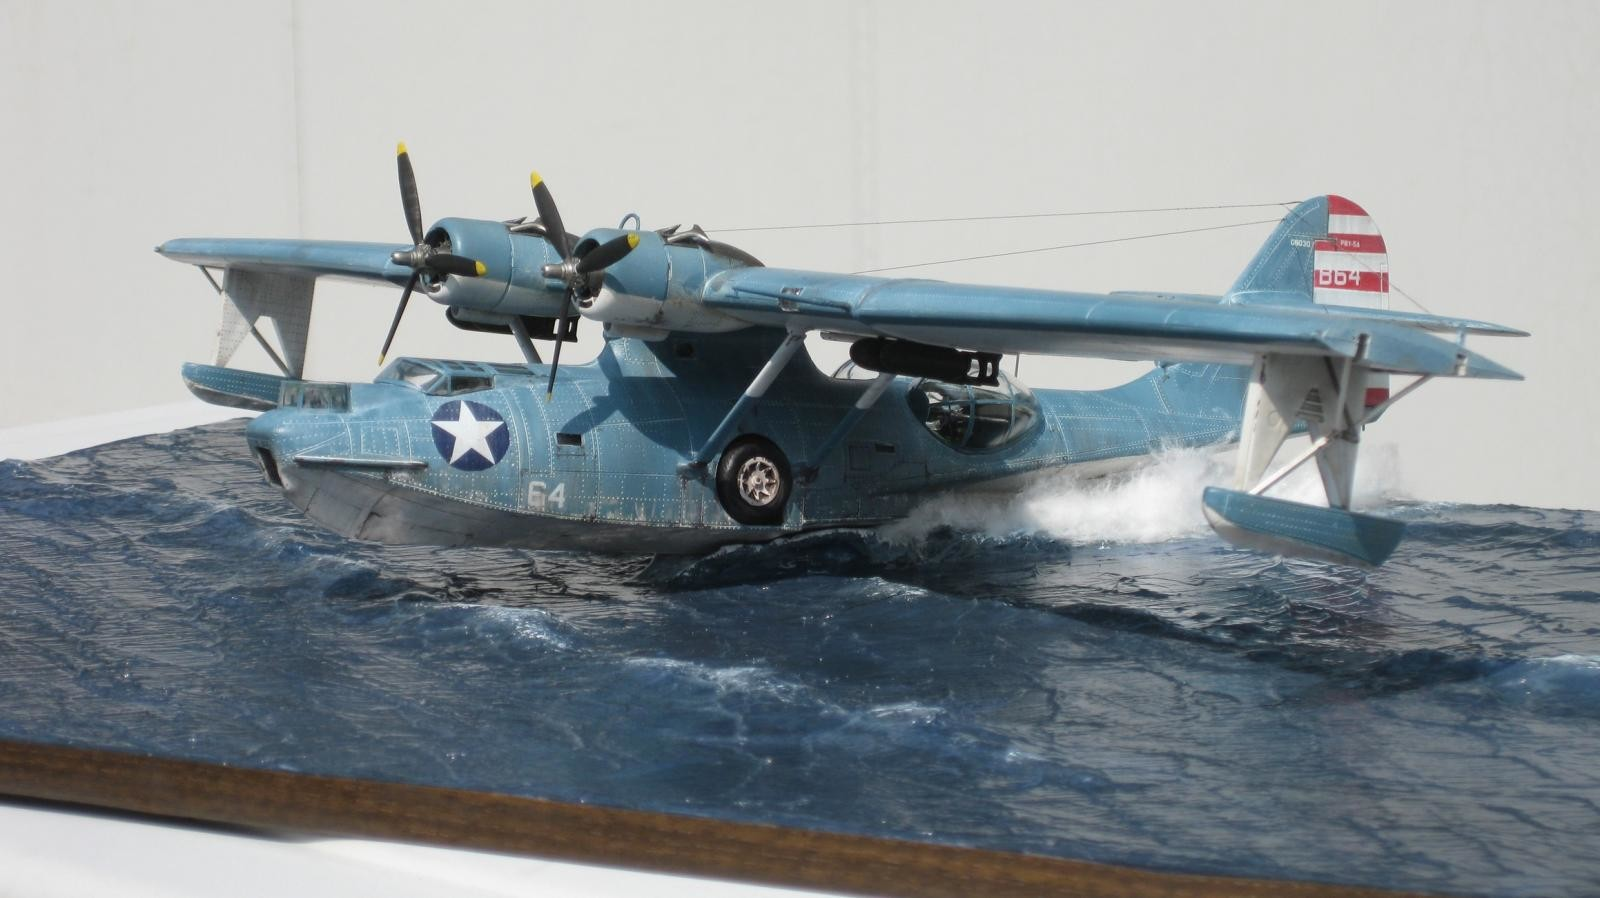 PBY-5A Catalina, 1/72, Academy | iModeler